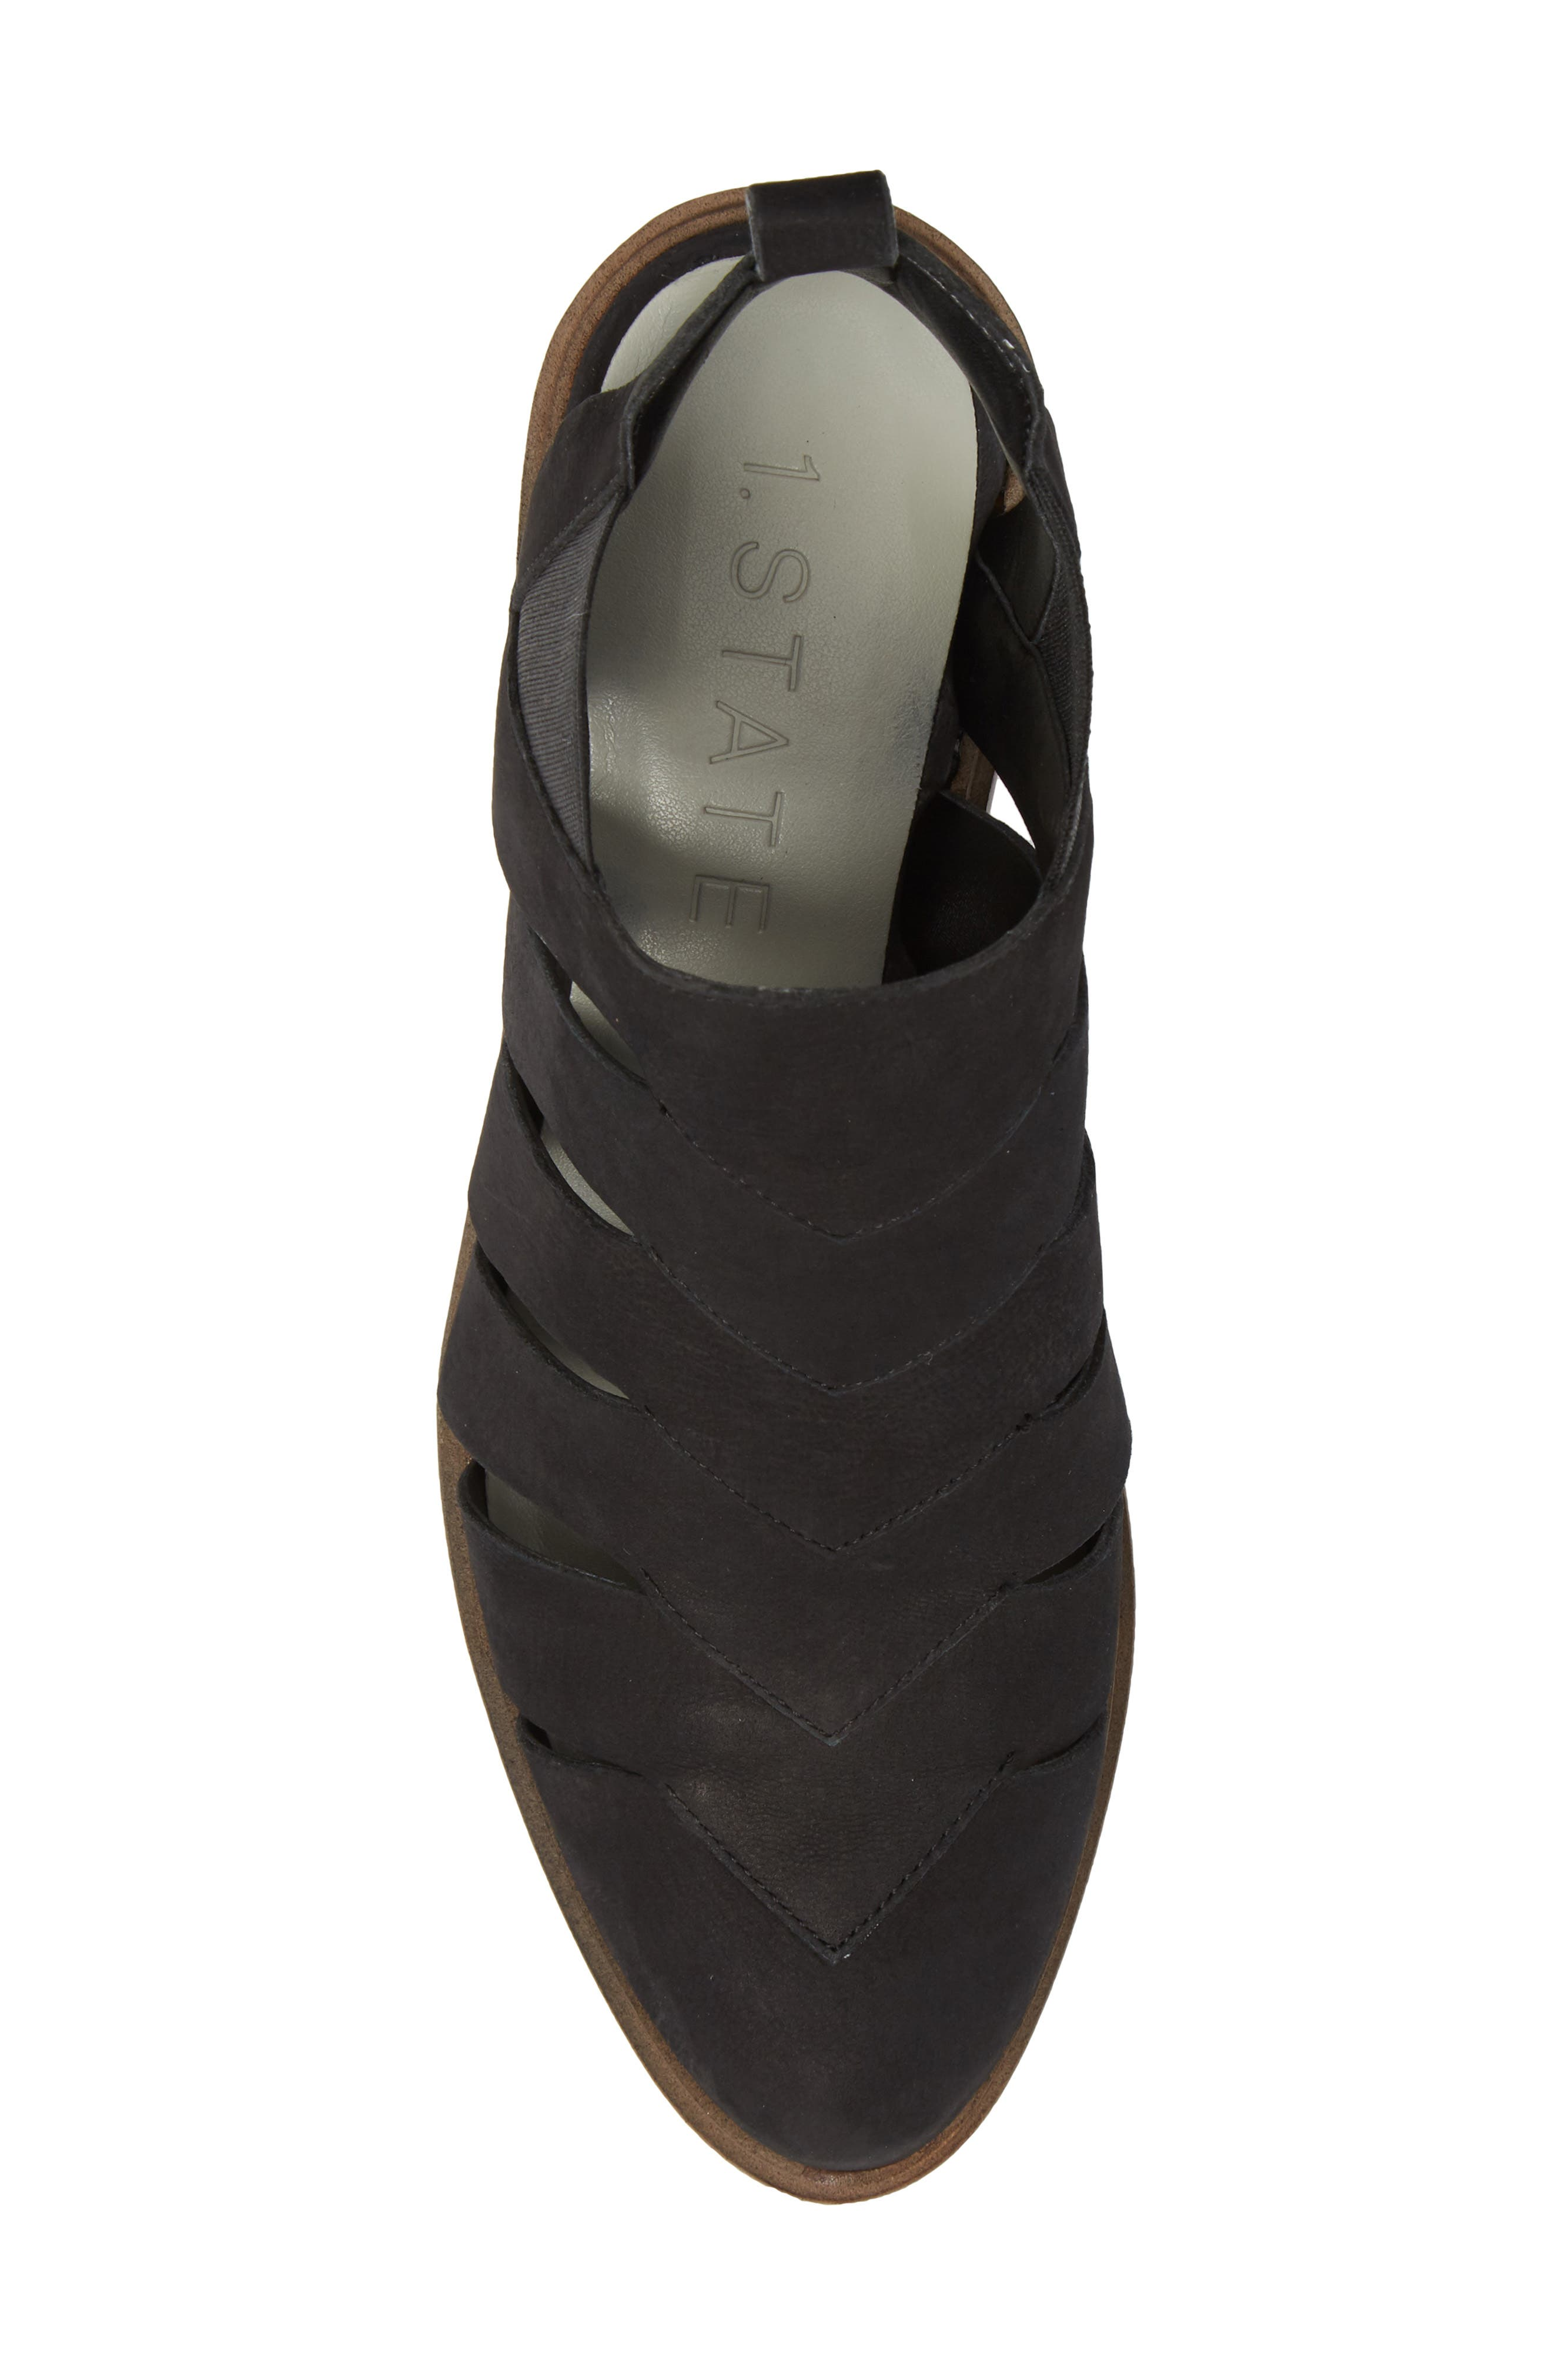 Amilee Bootie,                             Alternate thumbnail 5, color,                             Black Nubuck Leather